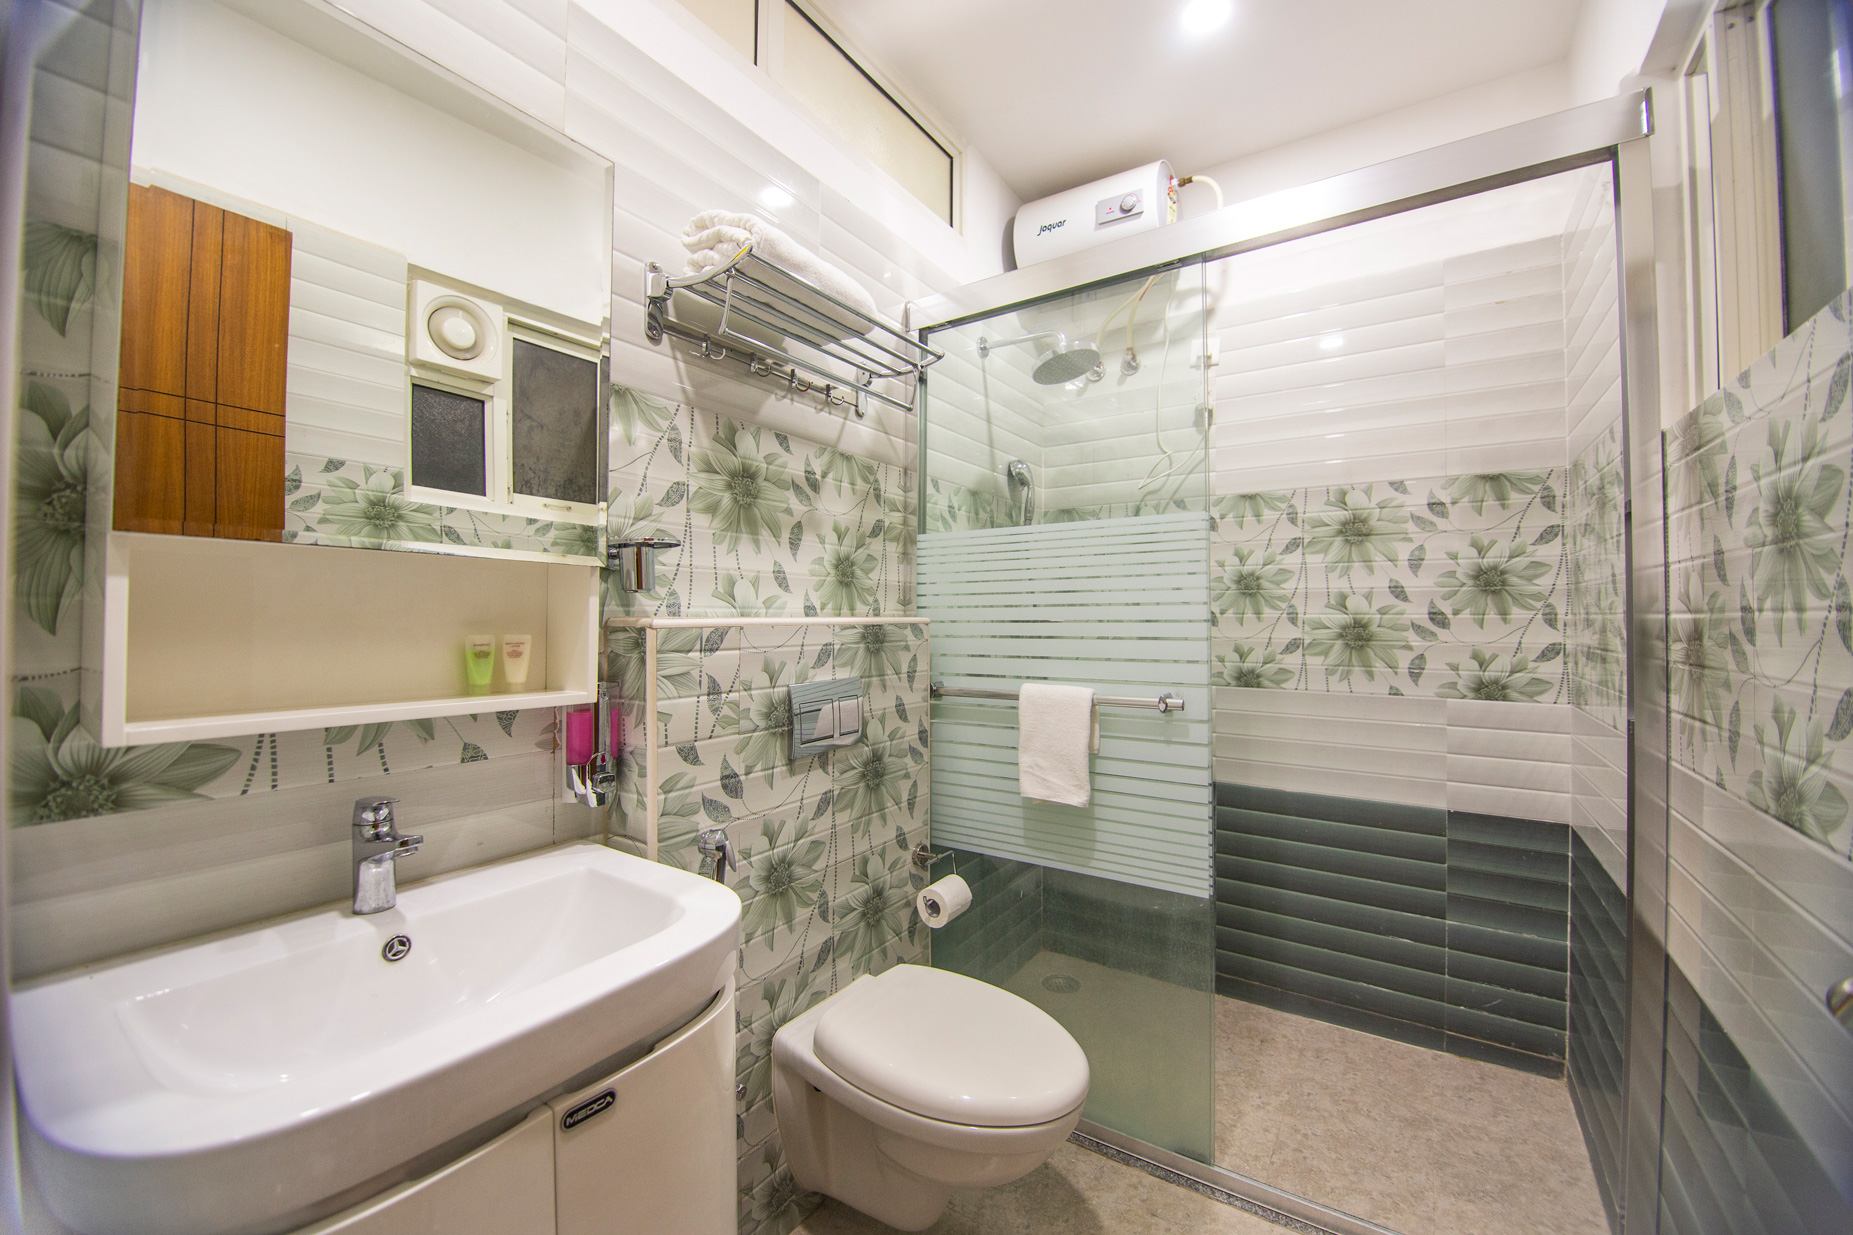 skyla-service-apartment-hyderabad-banjara-hills-bluefox-restaurant-3bhk7.jpg